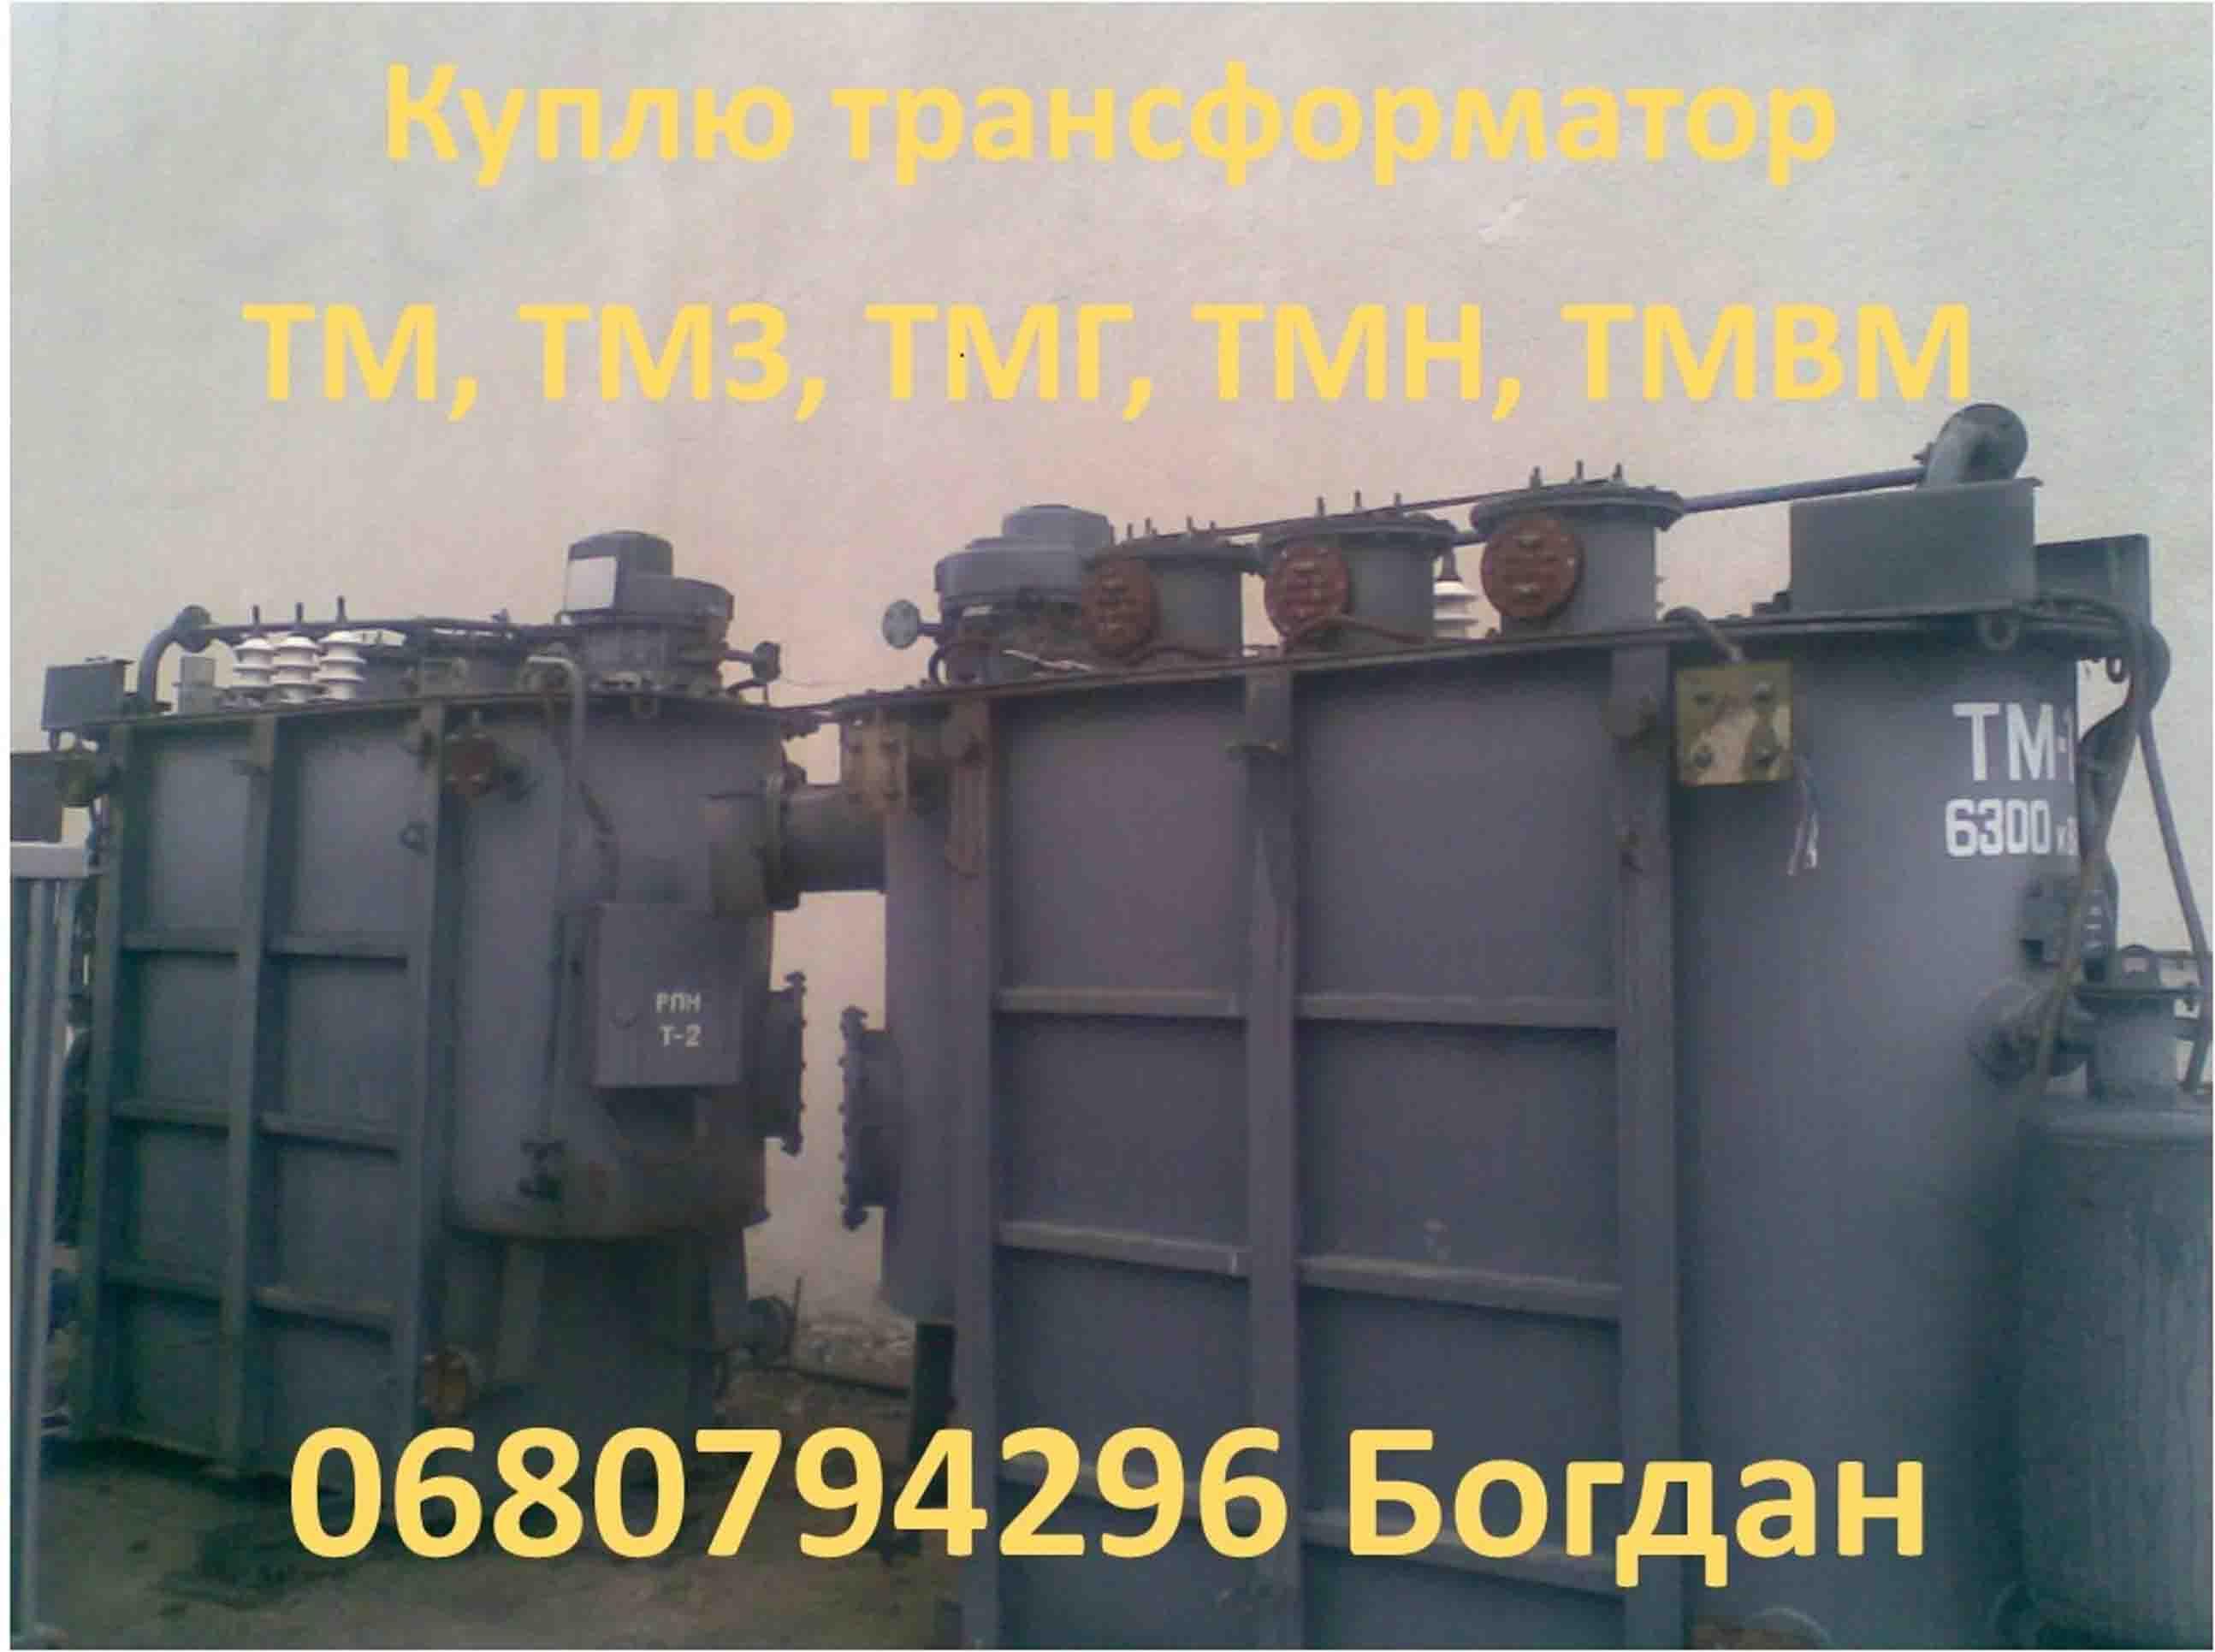 Покупаем силовые трансформаторы  ТМ, ТМН, ТМЗ, ТМГ, ТДН фото 1